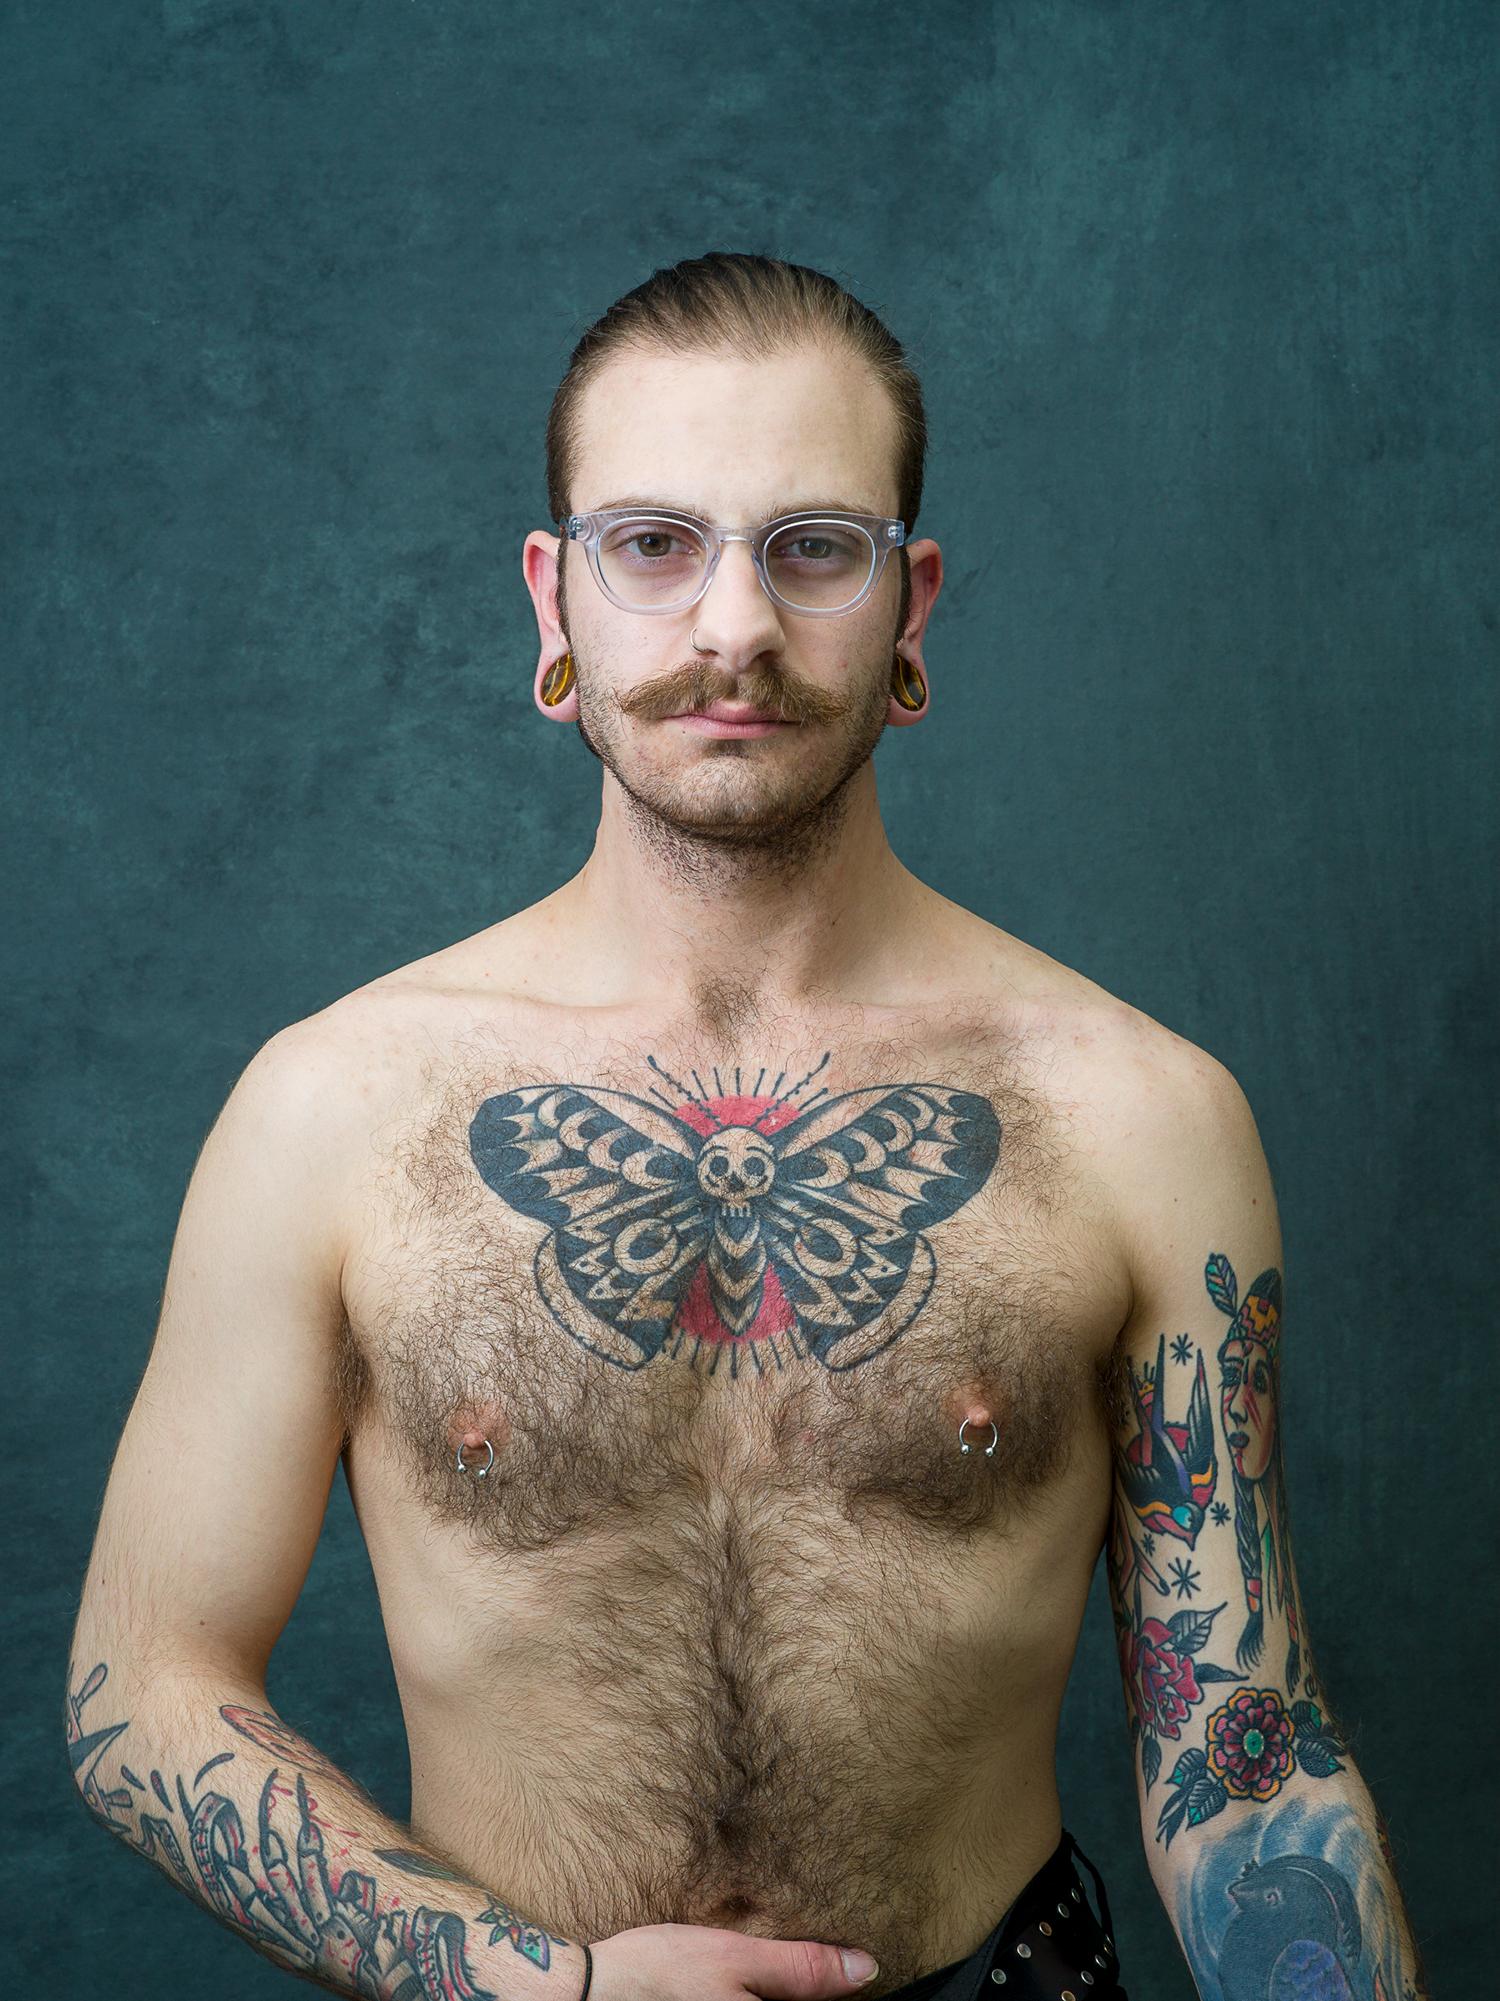 Intimate Strangers, Richard at 24, Post Chemo